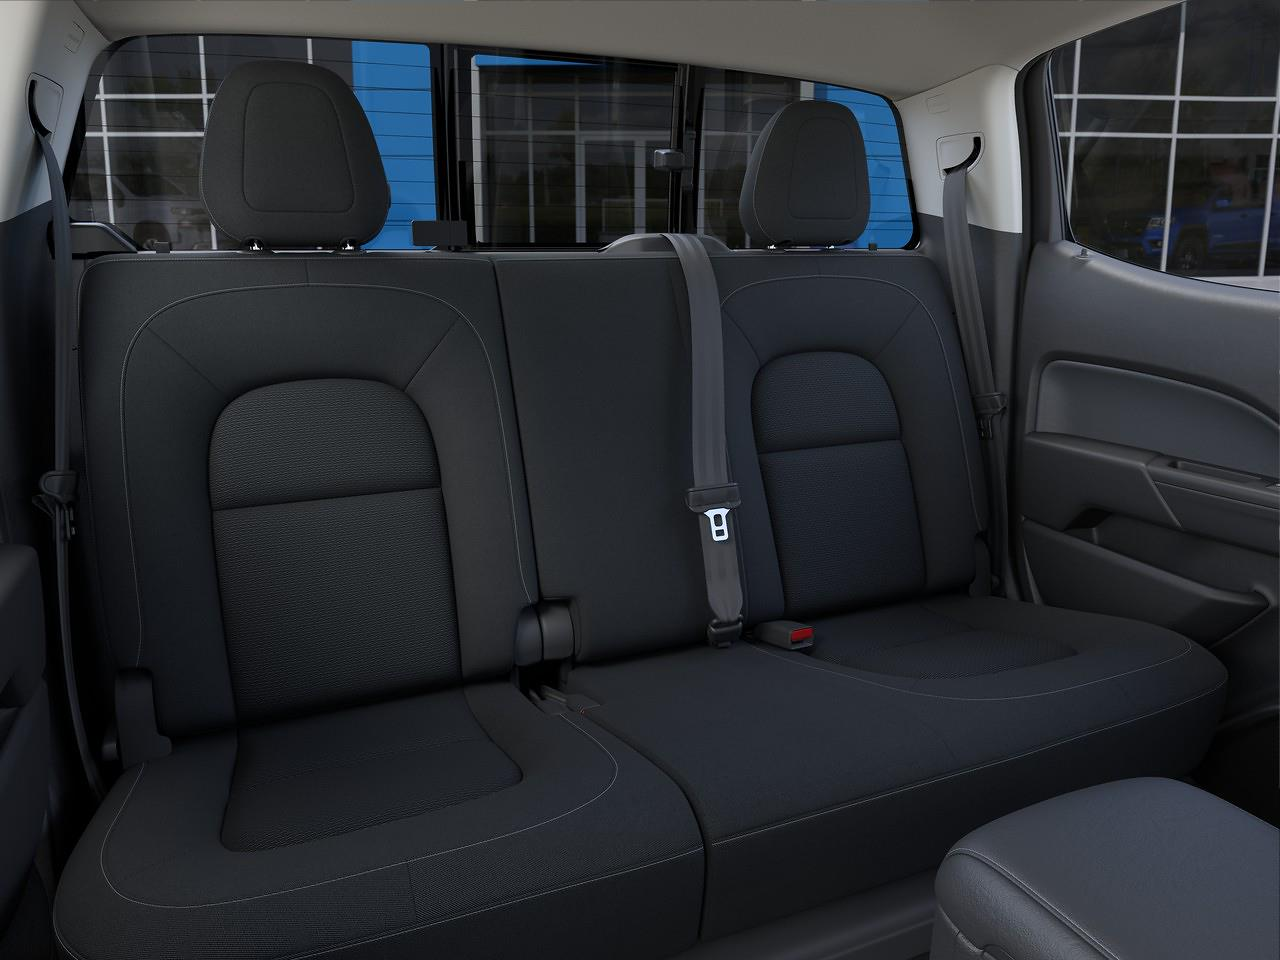 2021 Chevrolet Colorado Crew Cab 4x4, Pickup #Q210428 - photo 14